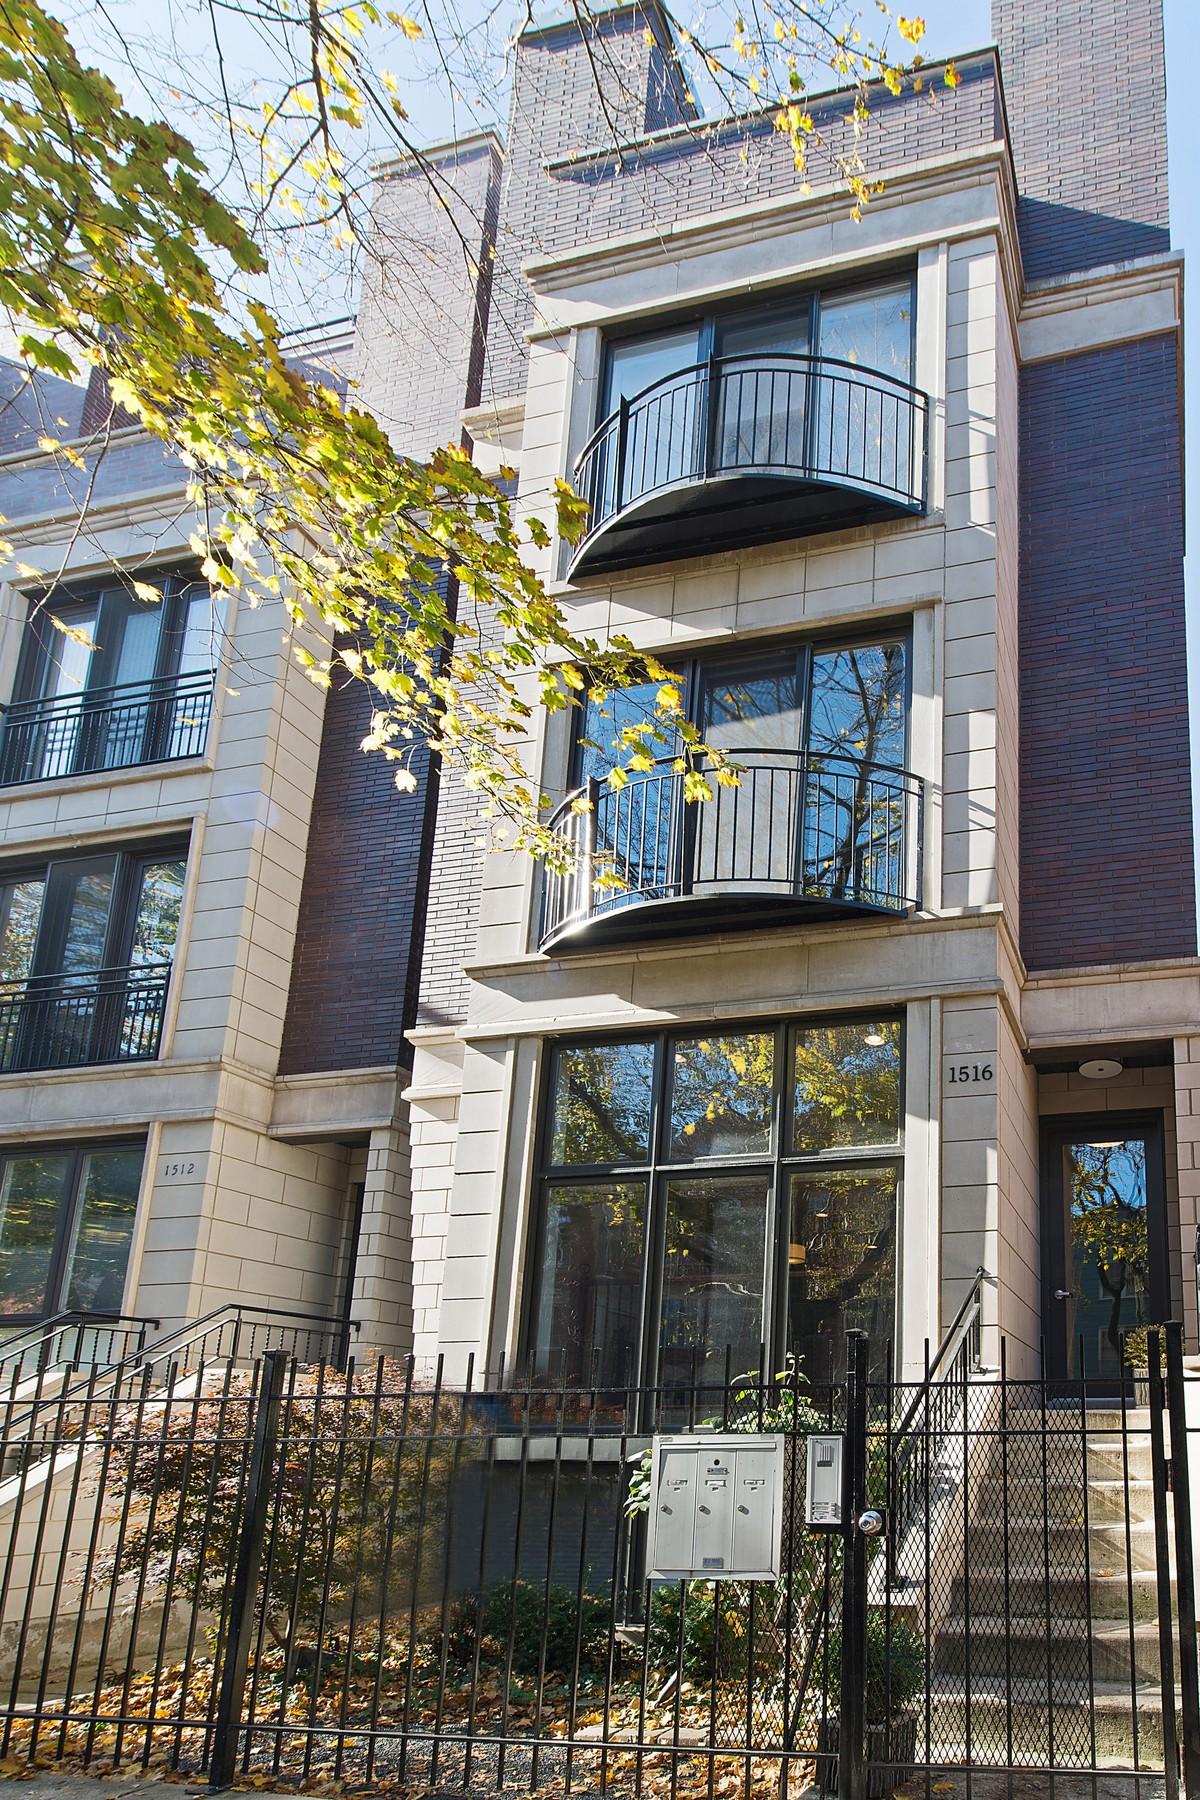 獨棟家庭住宅 為 出售 在 Beautiful Four Bedroom 1516 N Cleveland Avenue Unit 1 Chicago, 伊利諾斯州, 60610 美國